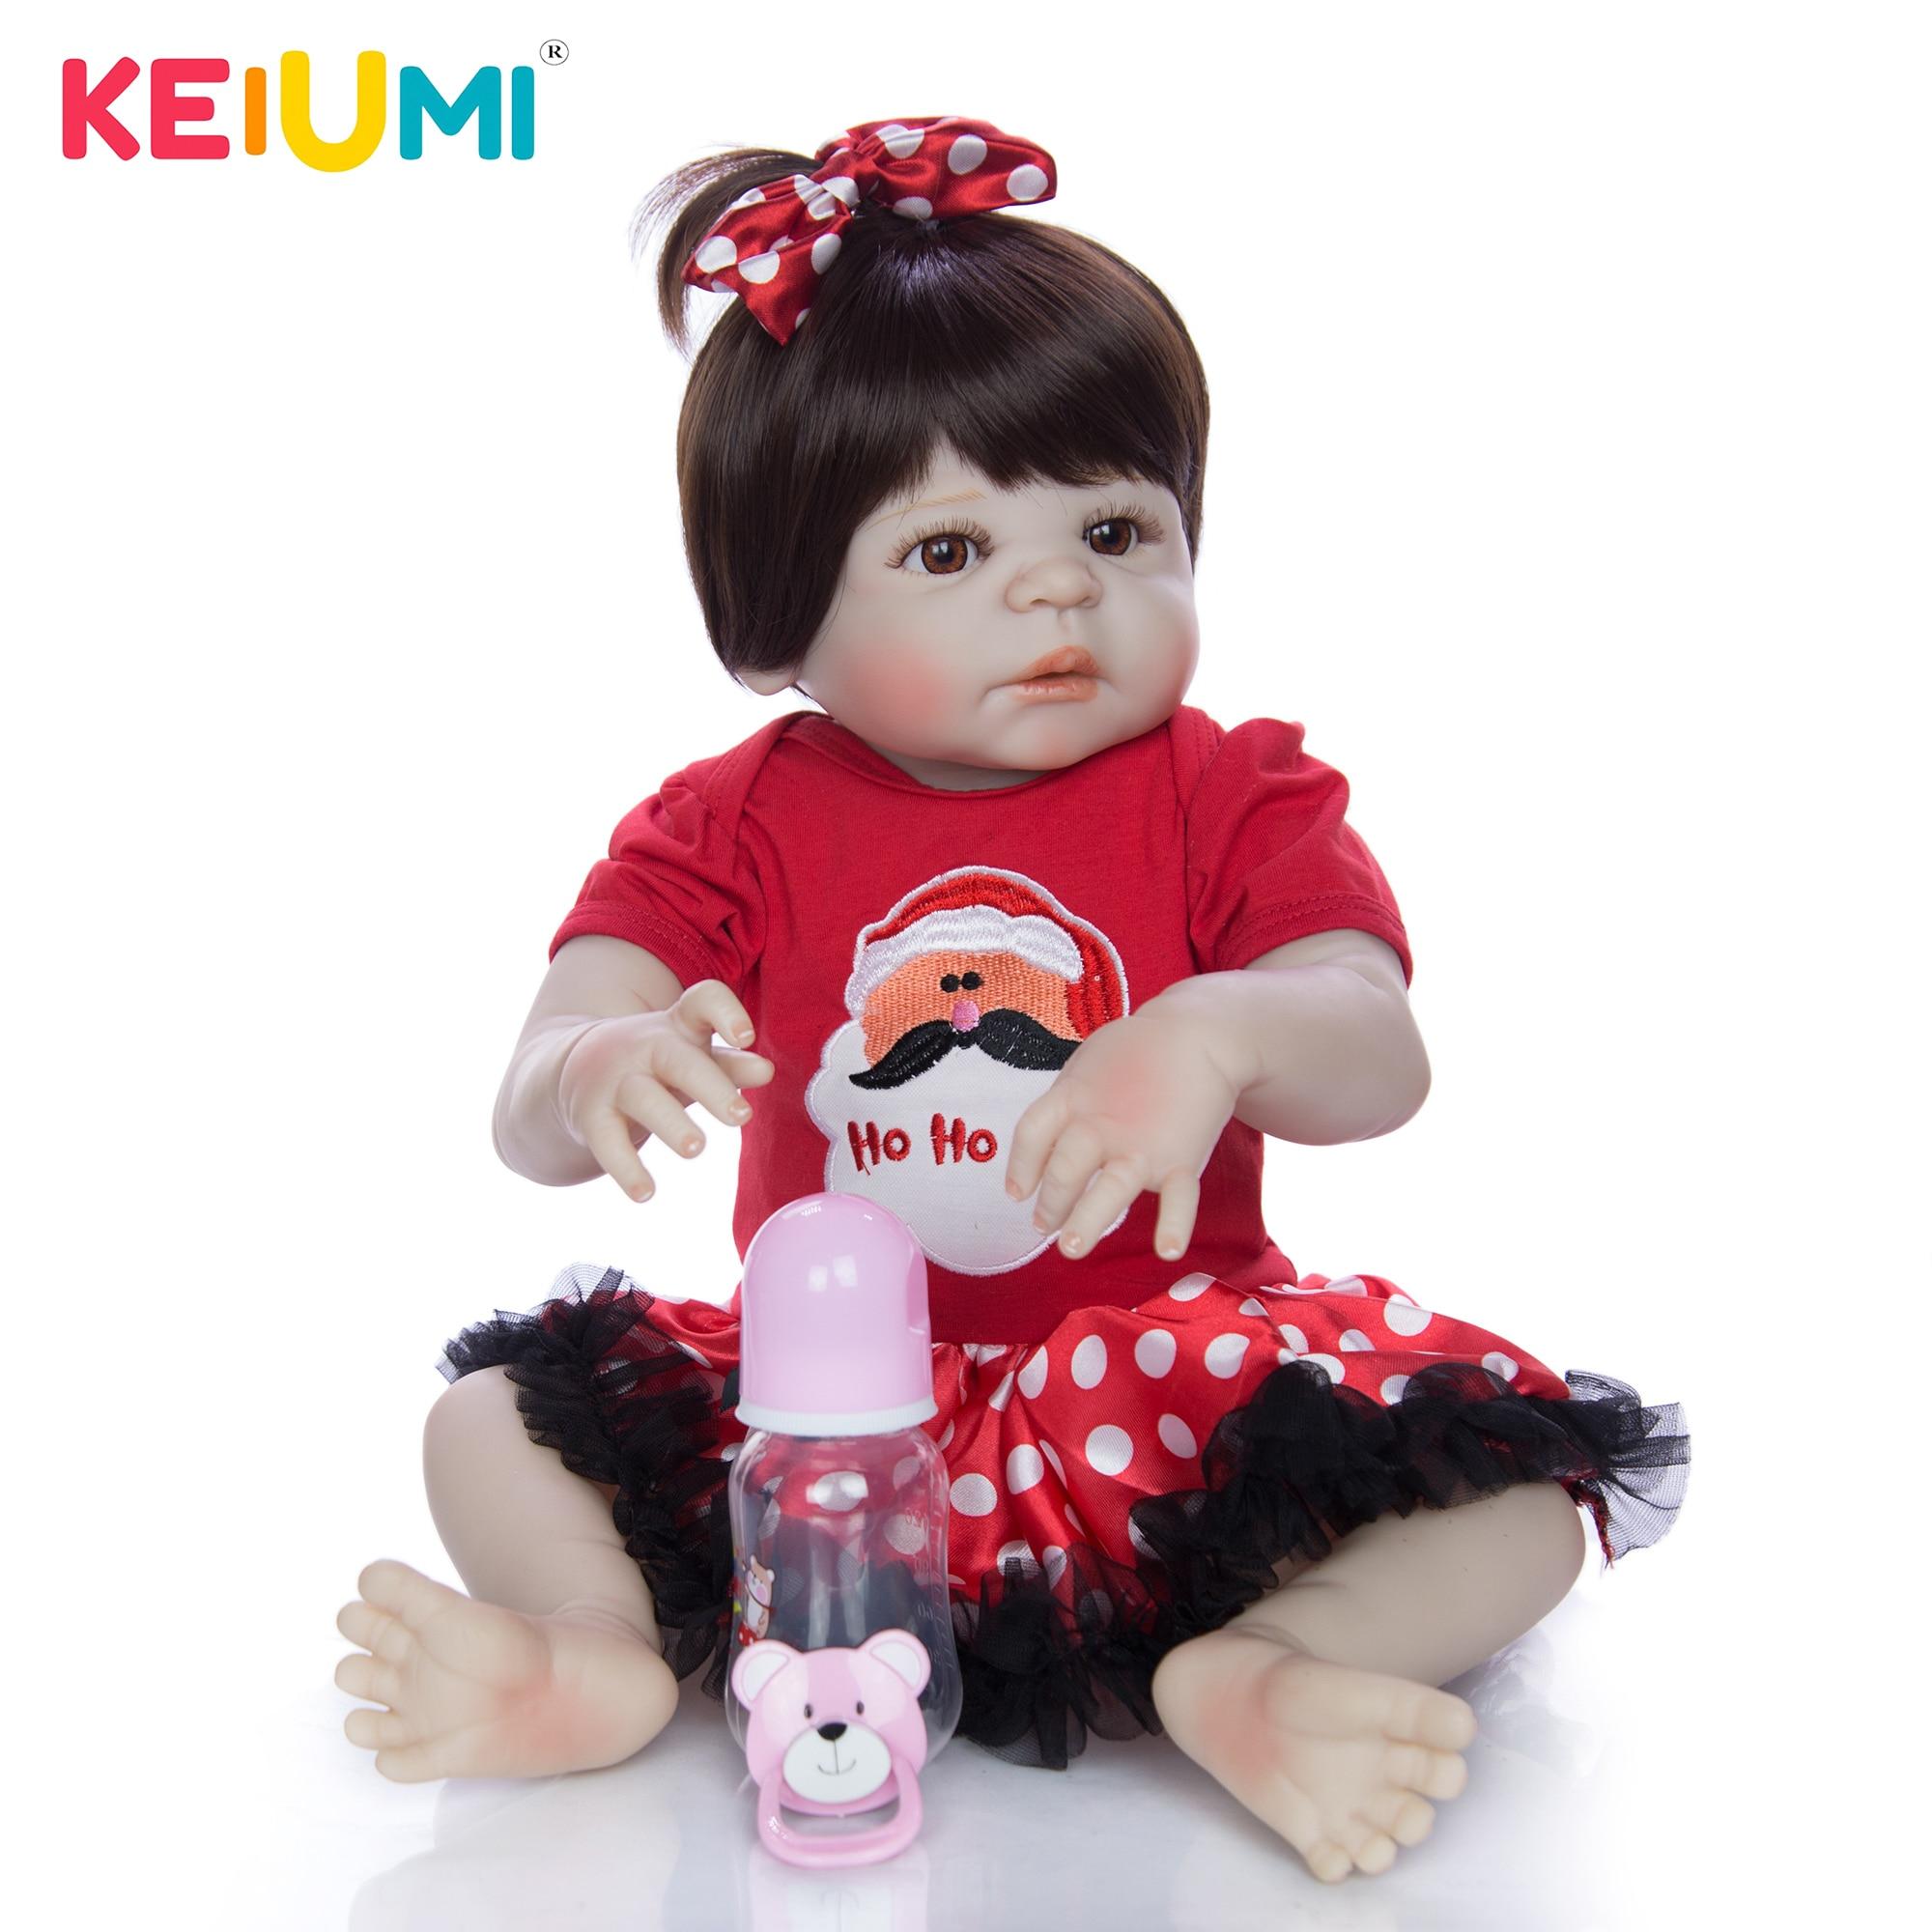 KEIUMI 23 Inch Handmade Baby Girl Dolls Reborn Full Silicone Reborn Bonecas Bebe Alive Toy For